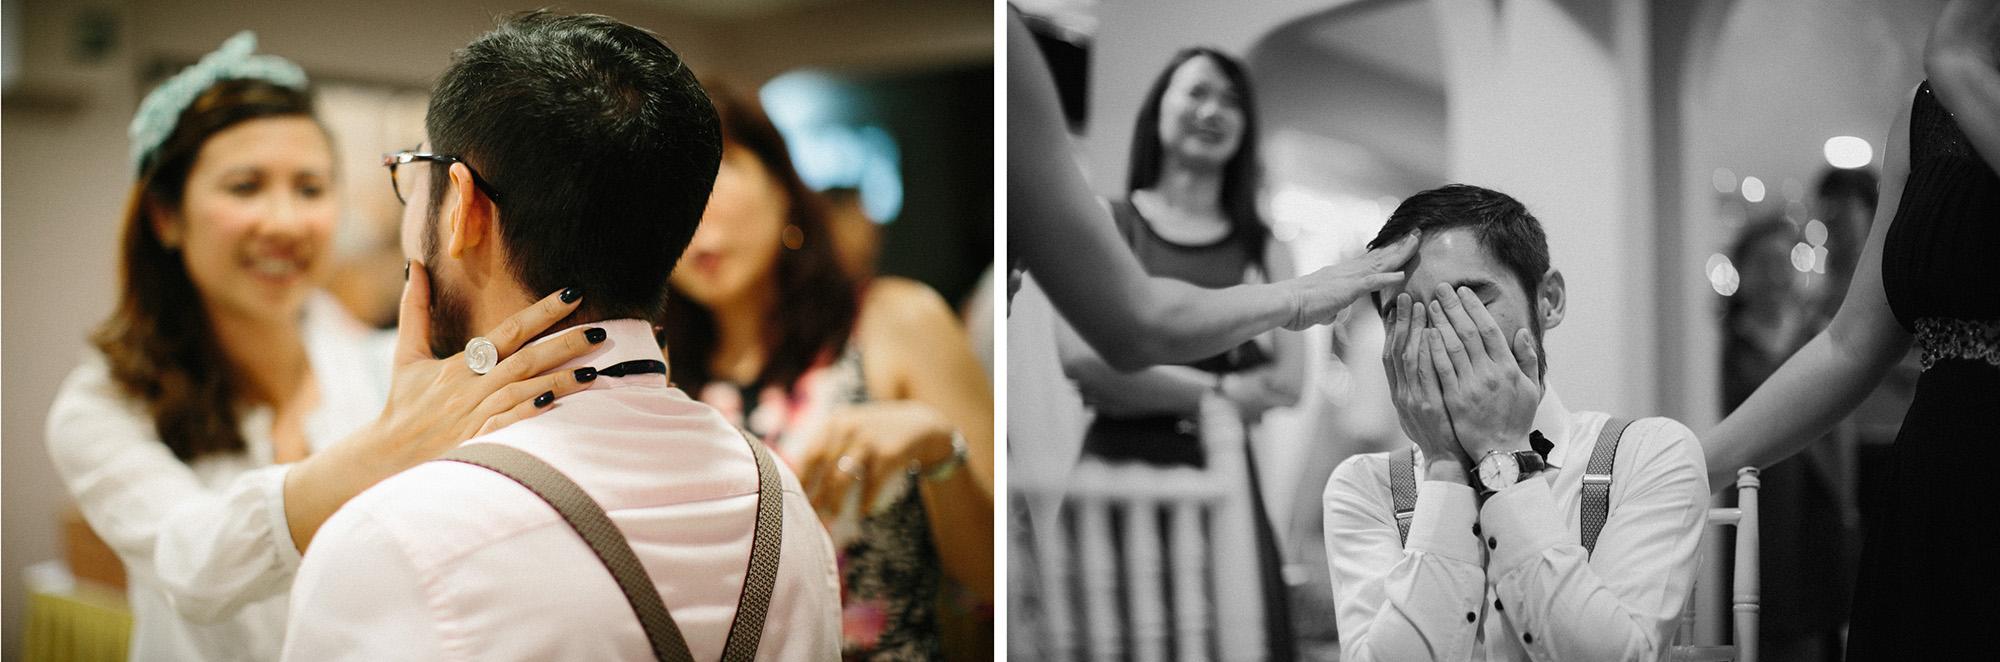 105-hellojanelee-sam grace-malaysia-wedding-day